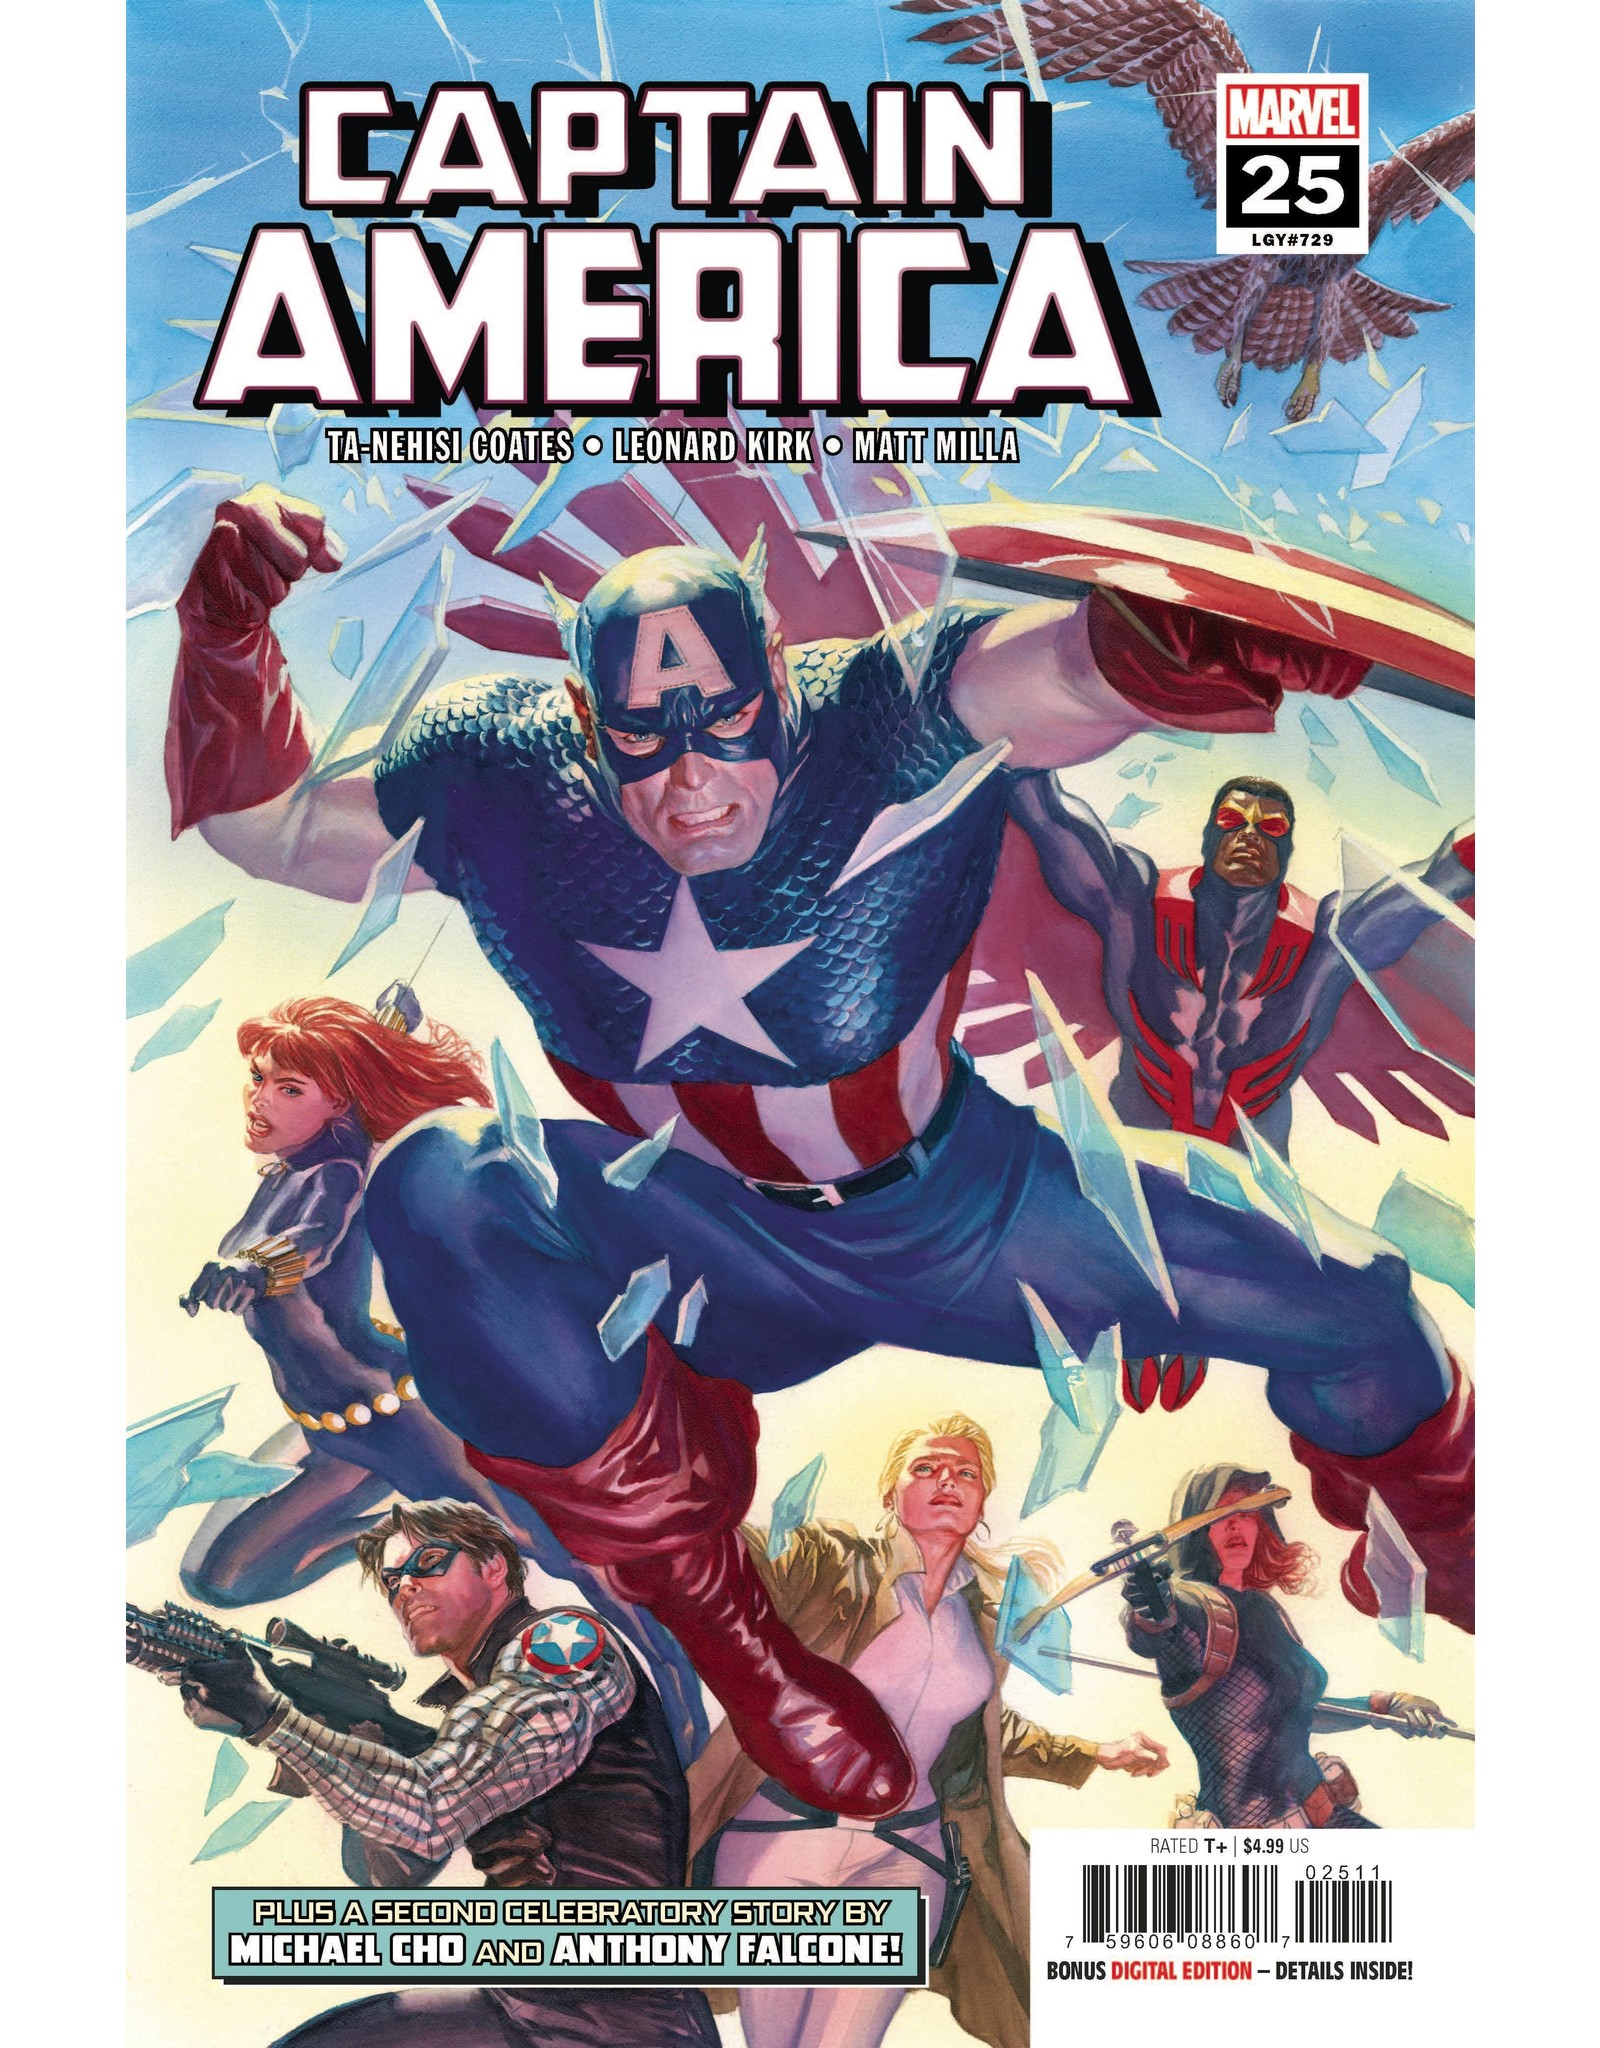 MARVEL COMICS CAPTAIN AMERICA #25